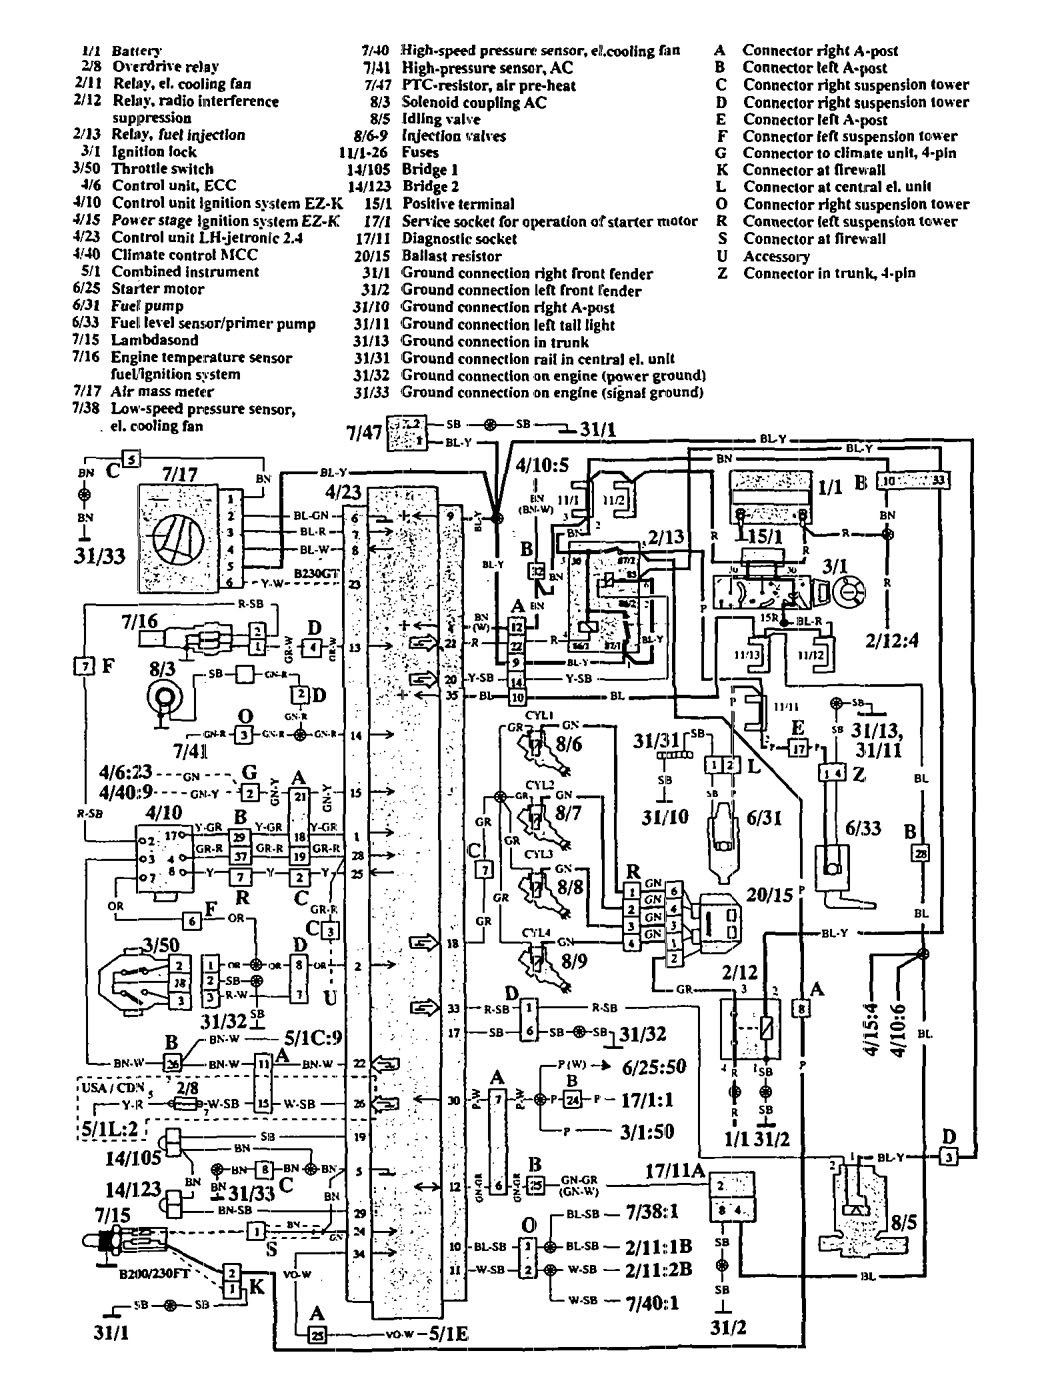 volvo 940 ignition wiring diagram